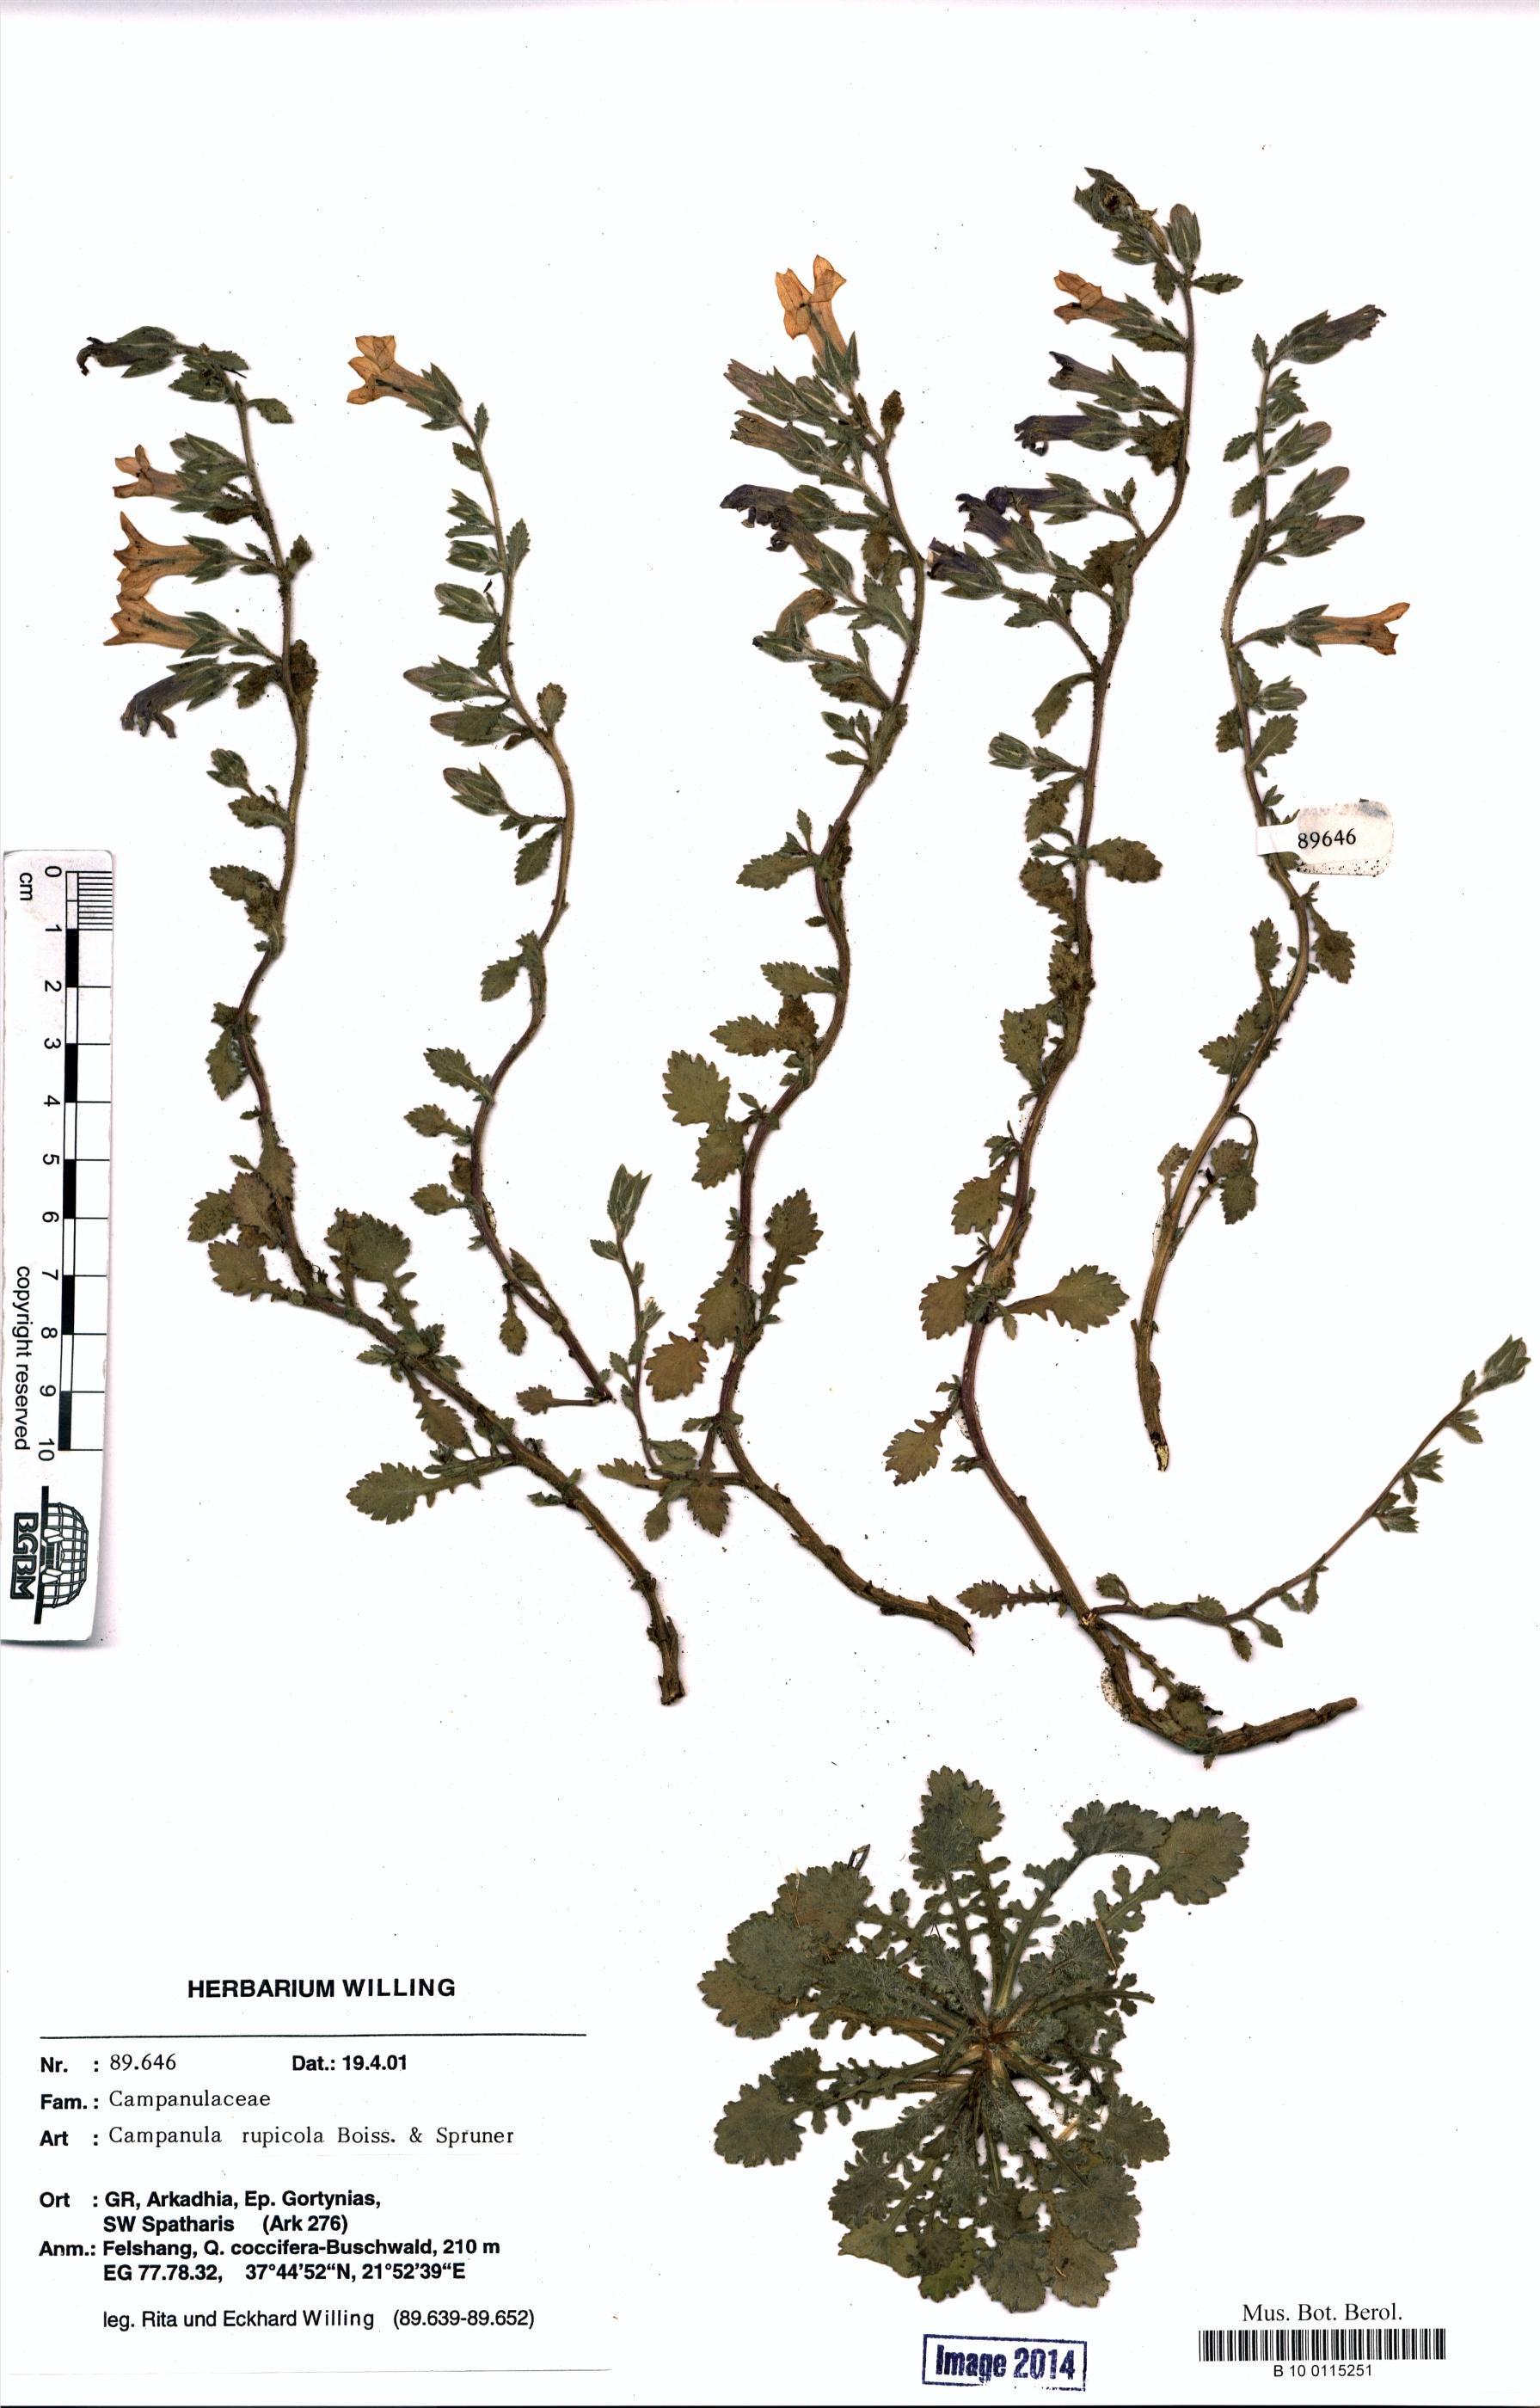 http://ww2.bgbm.org/herbarium/images/B/10/01/15/25/B_10_0115251.jpg